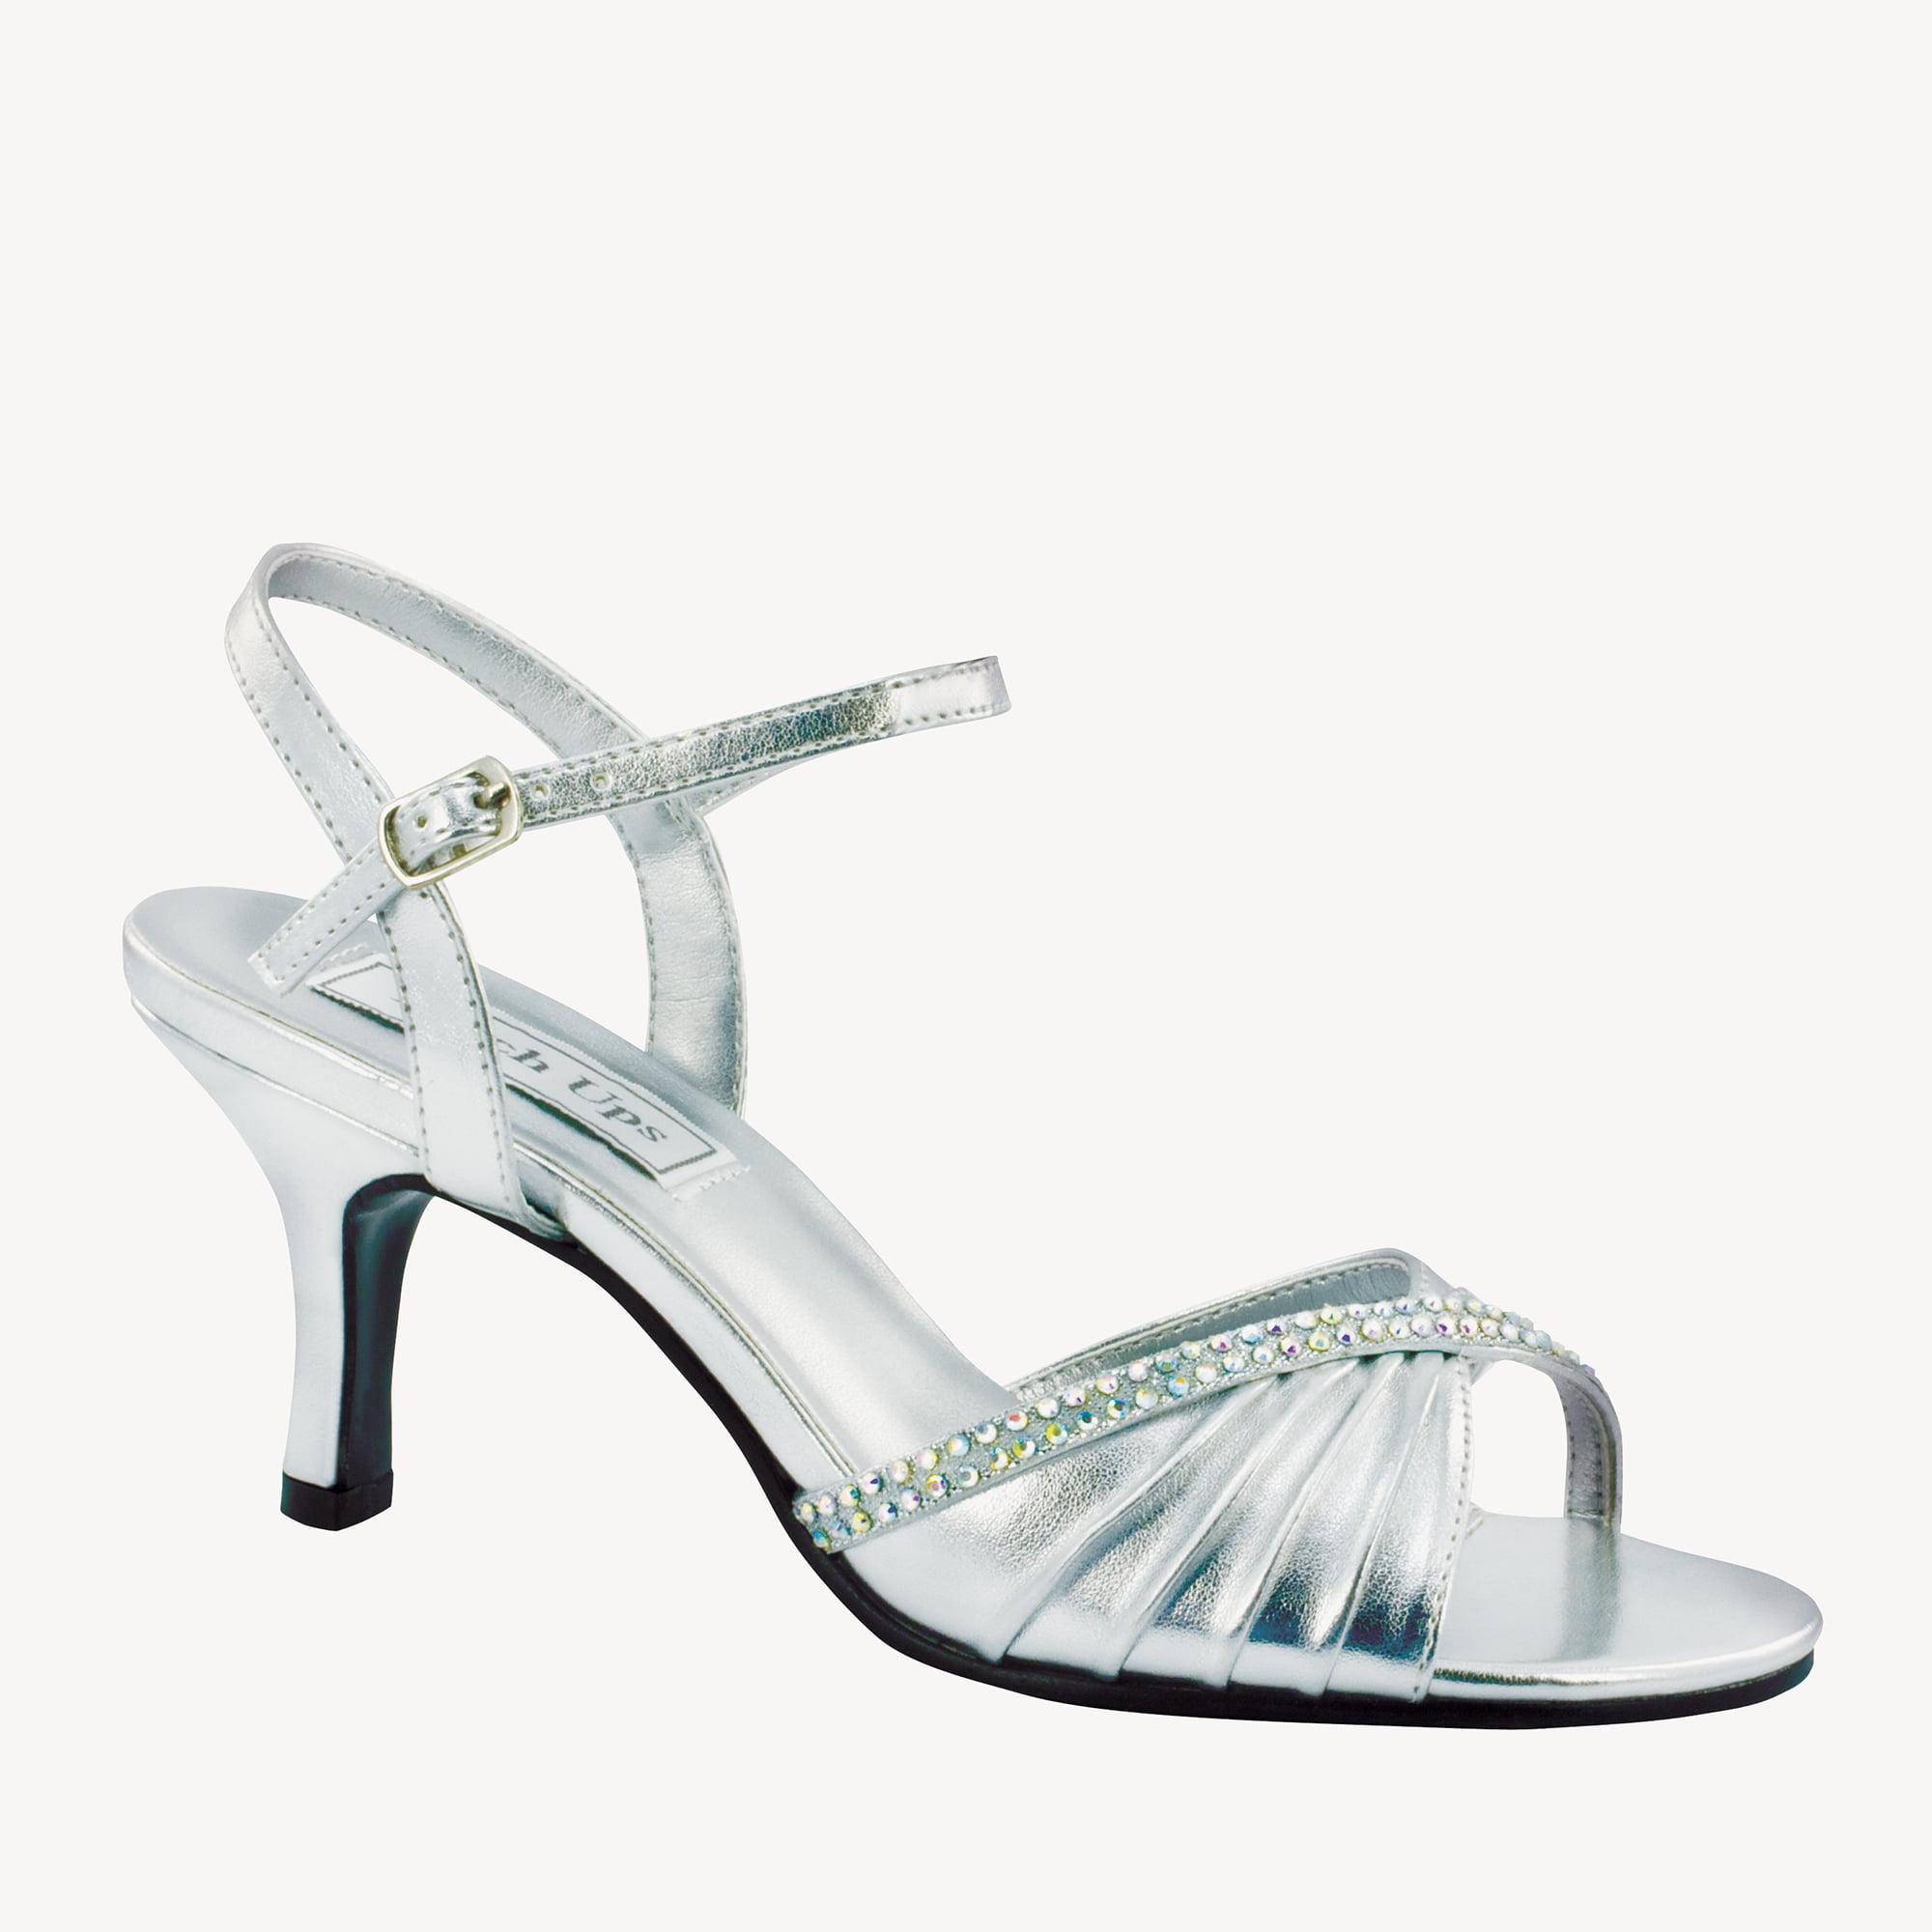 Benjamin Walk 539WO_10.5 Val Shoes Wide in Silver Metallic - Size 10.5